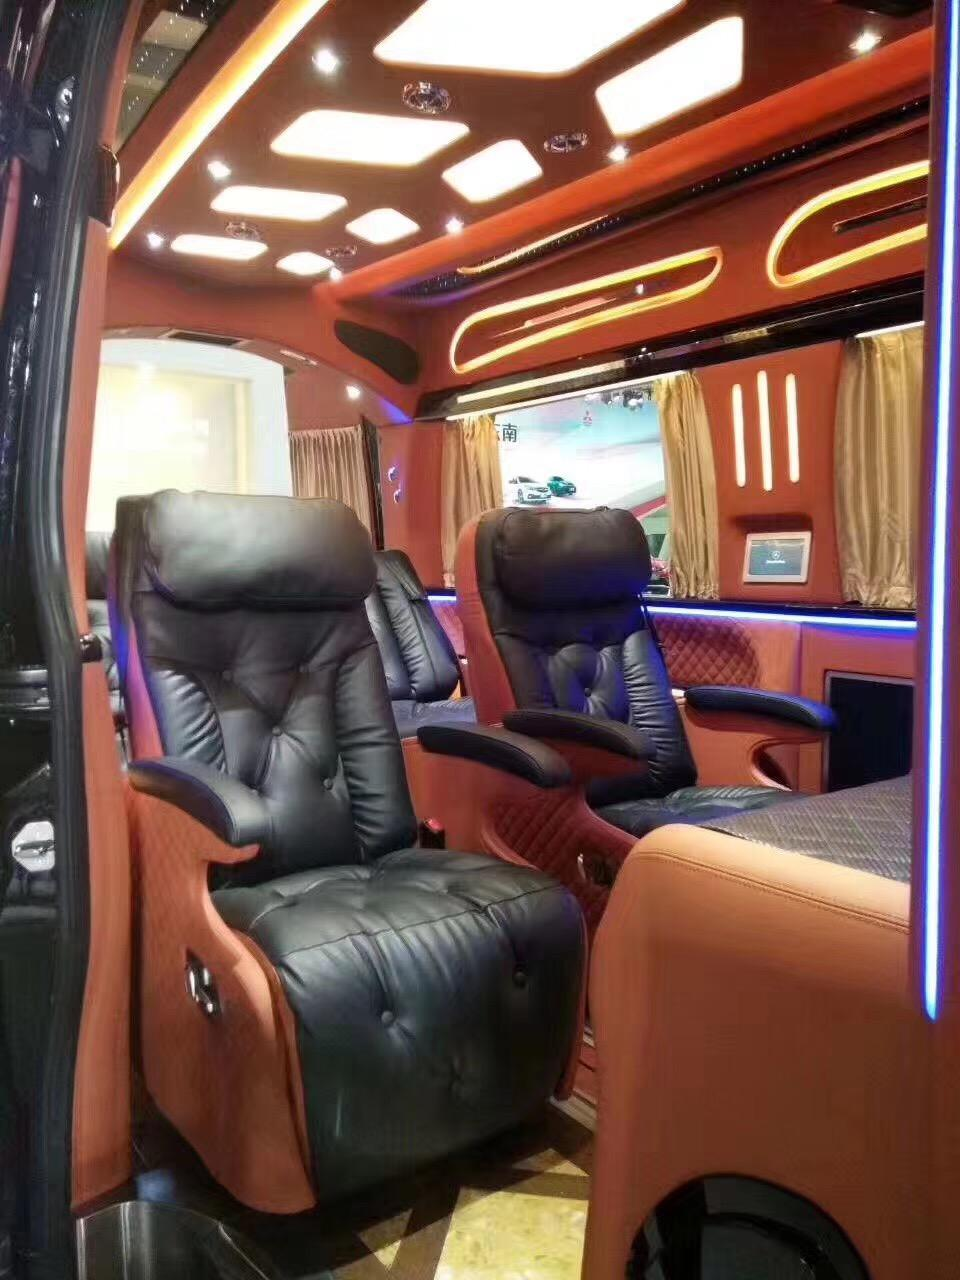 mpv顶级奔驰斯宾特商务房车 全球限量版